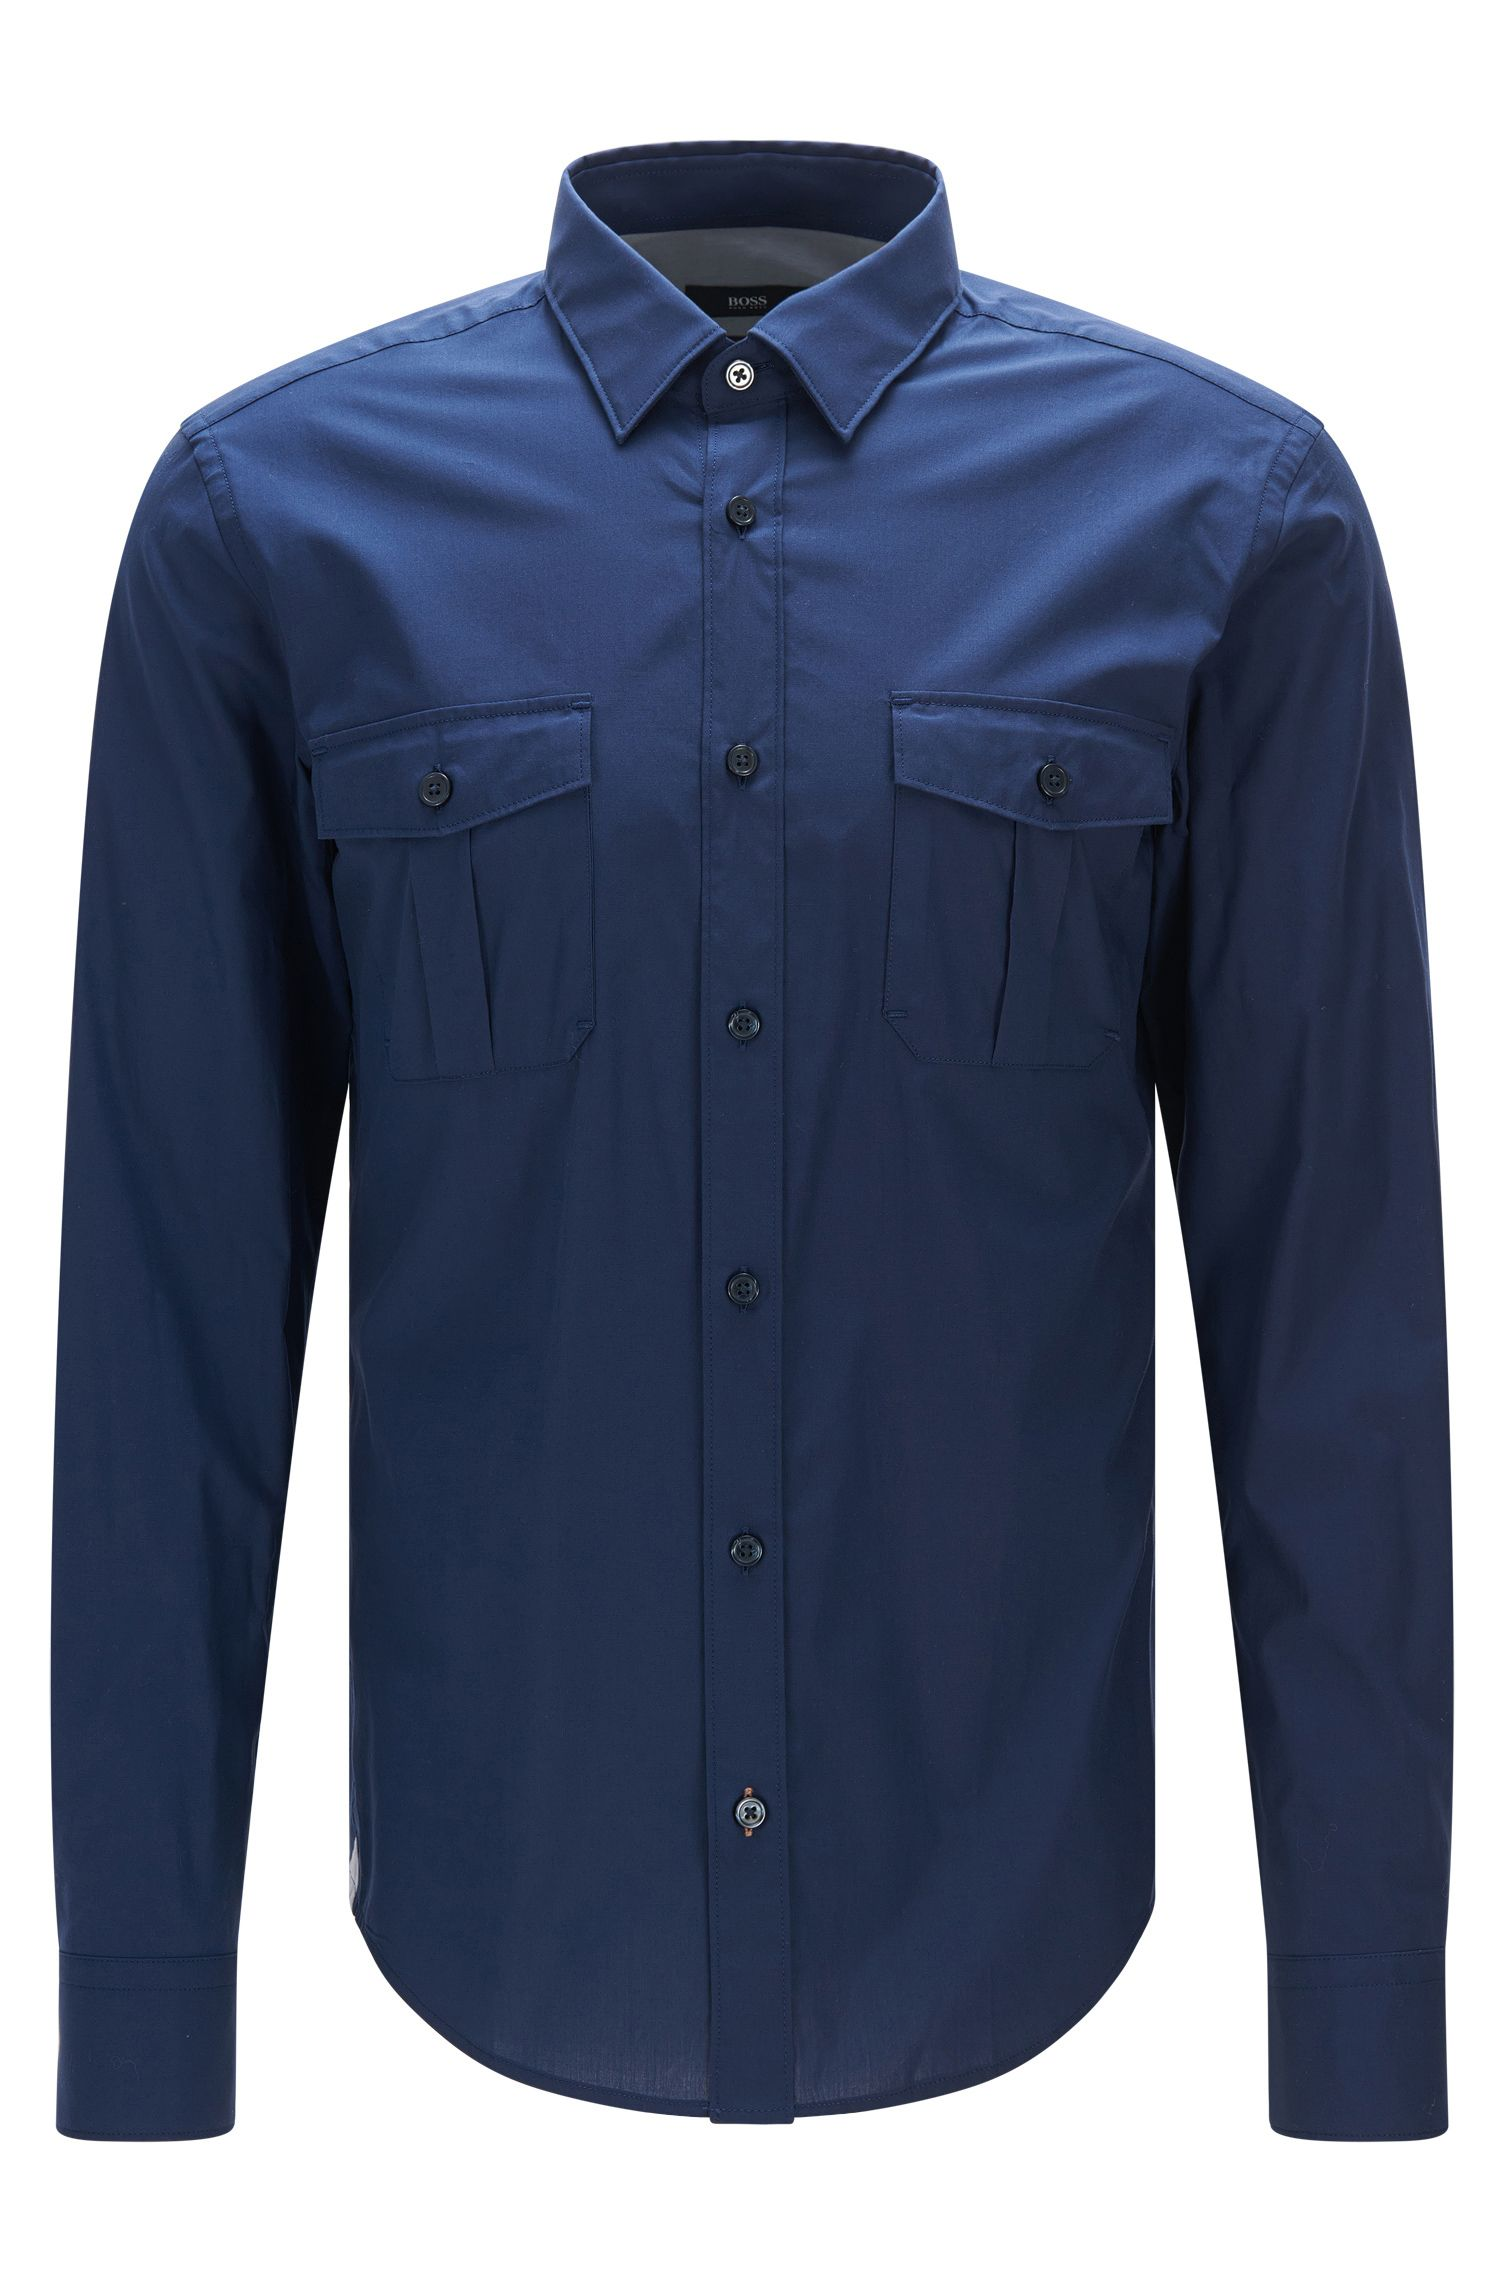 'Ramsey' | Slim Fit, Stretch Cotton Button Down Shirt